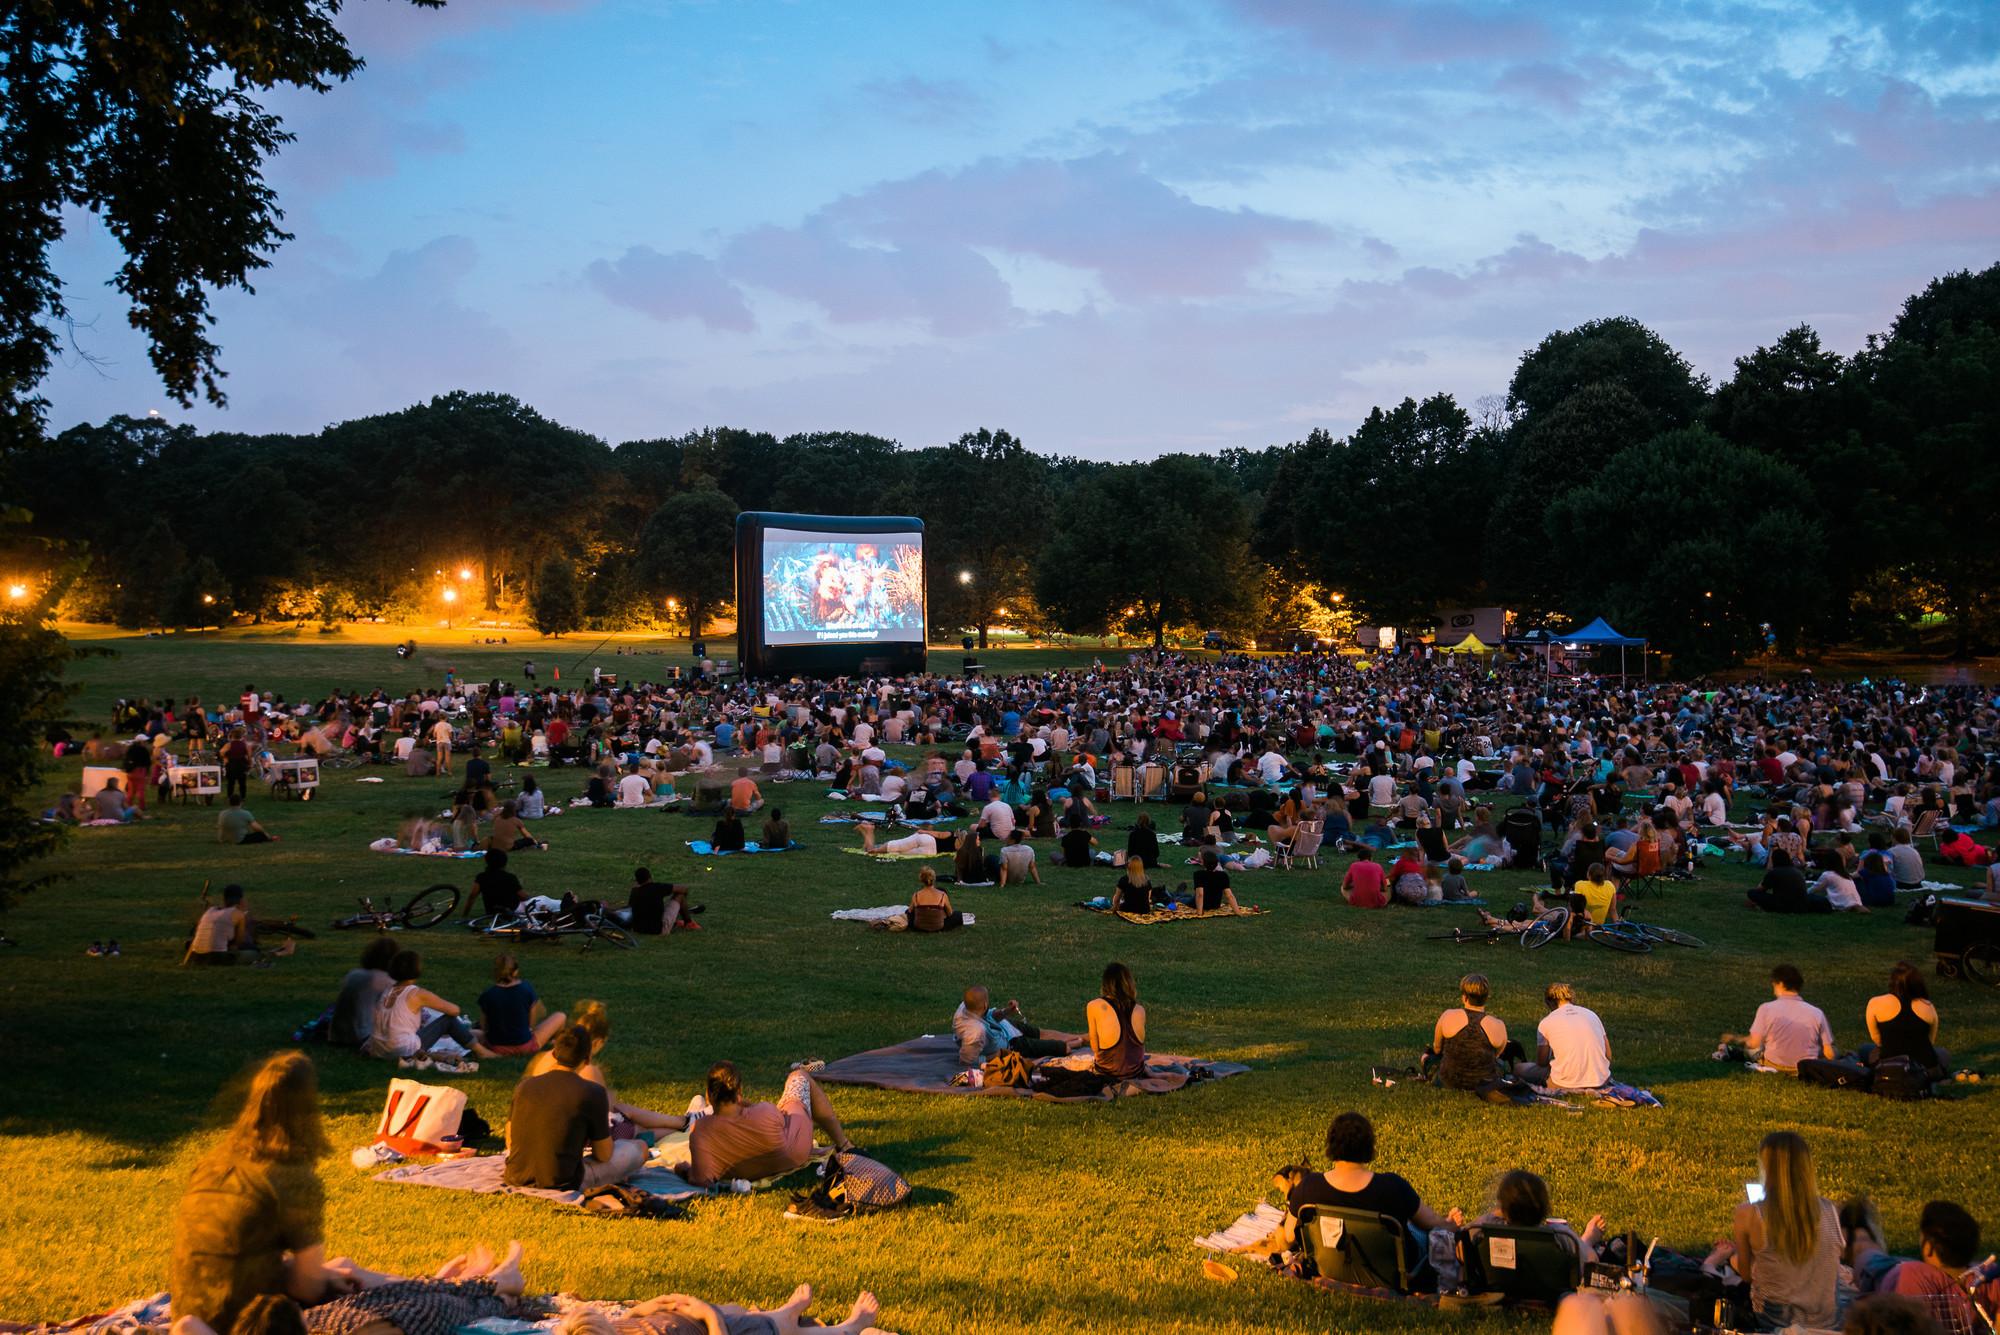 Prospect Park Movie under the stars